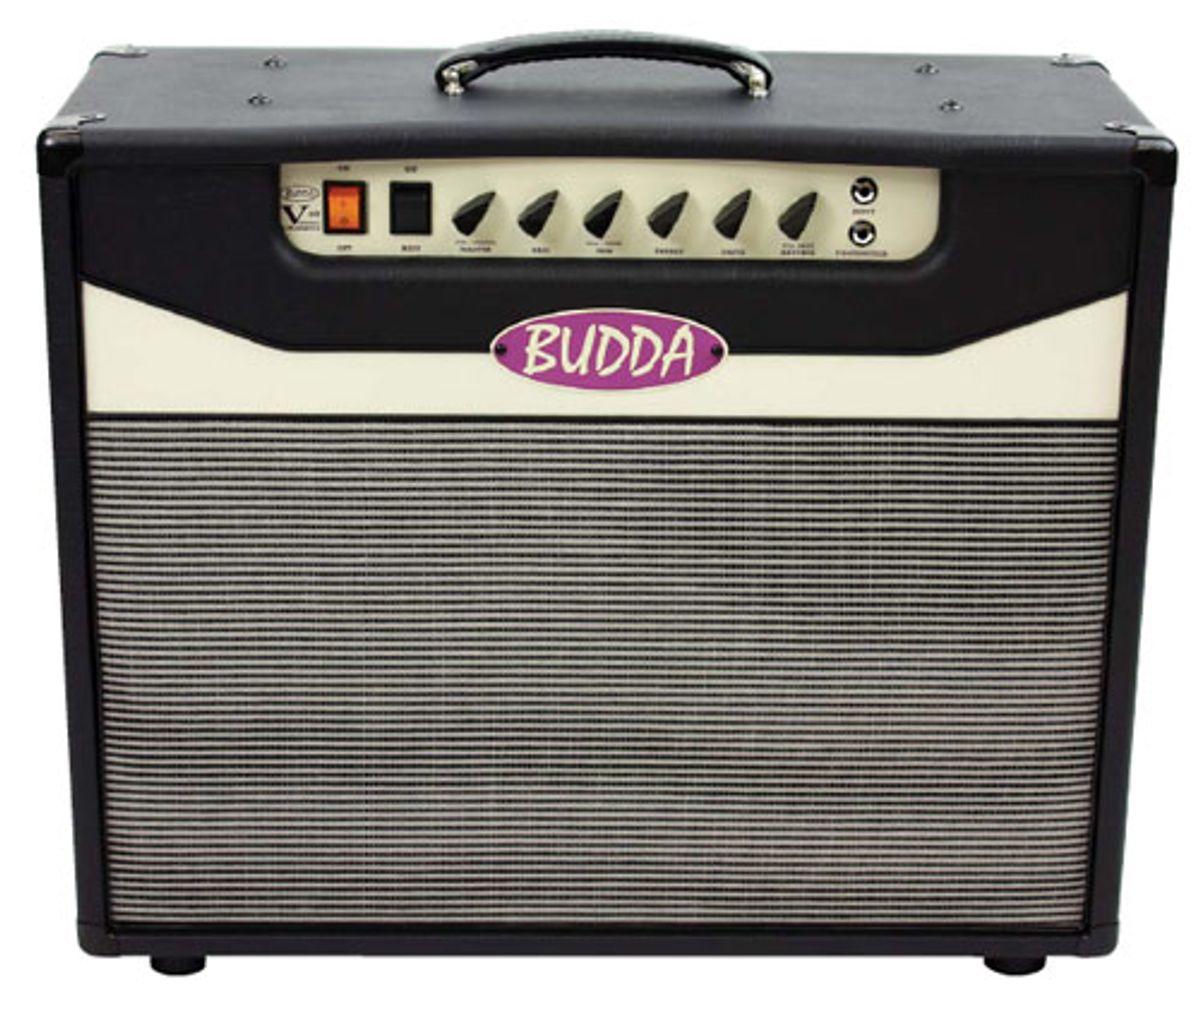 Budda Amplification Superdrive Series II V-40 Amp Review